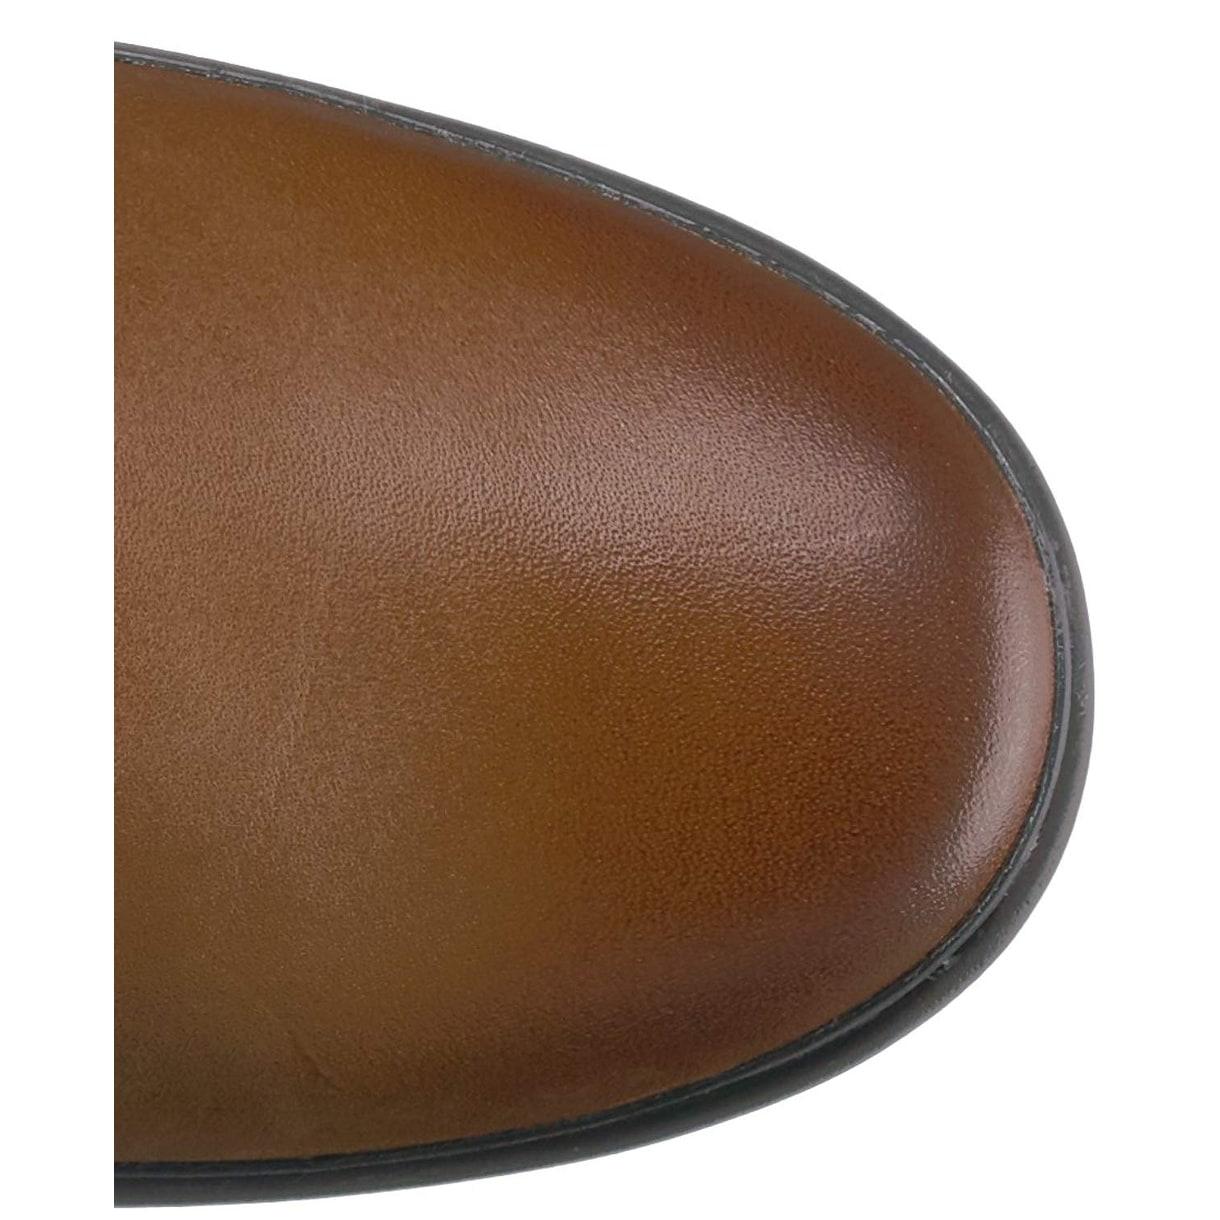 7f8e59ebb3d Ugg Womens Janina Leather Closed Toe Knee High Fashion Boots